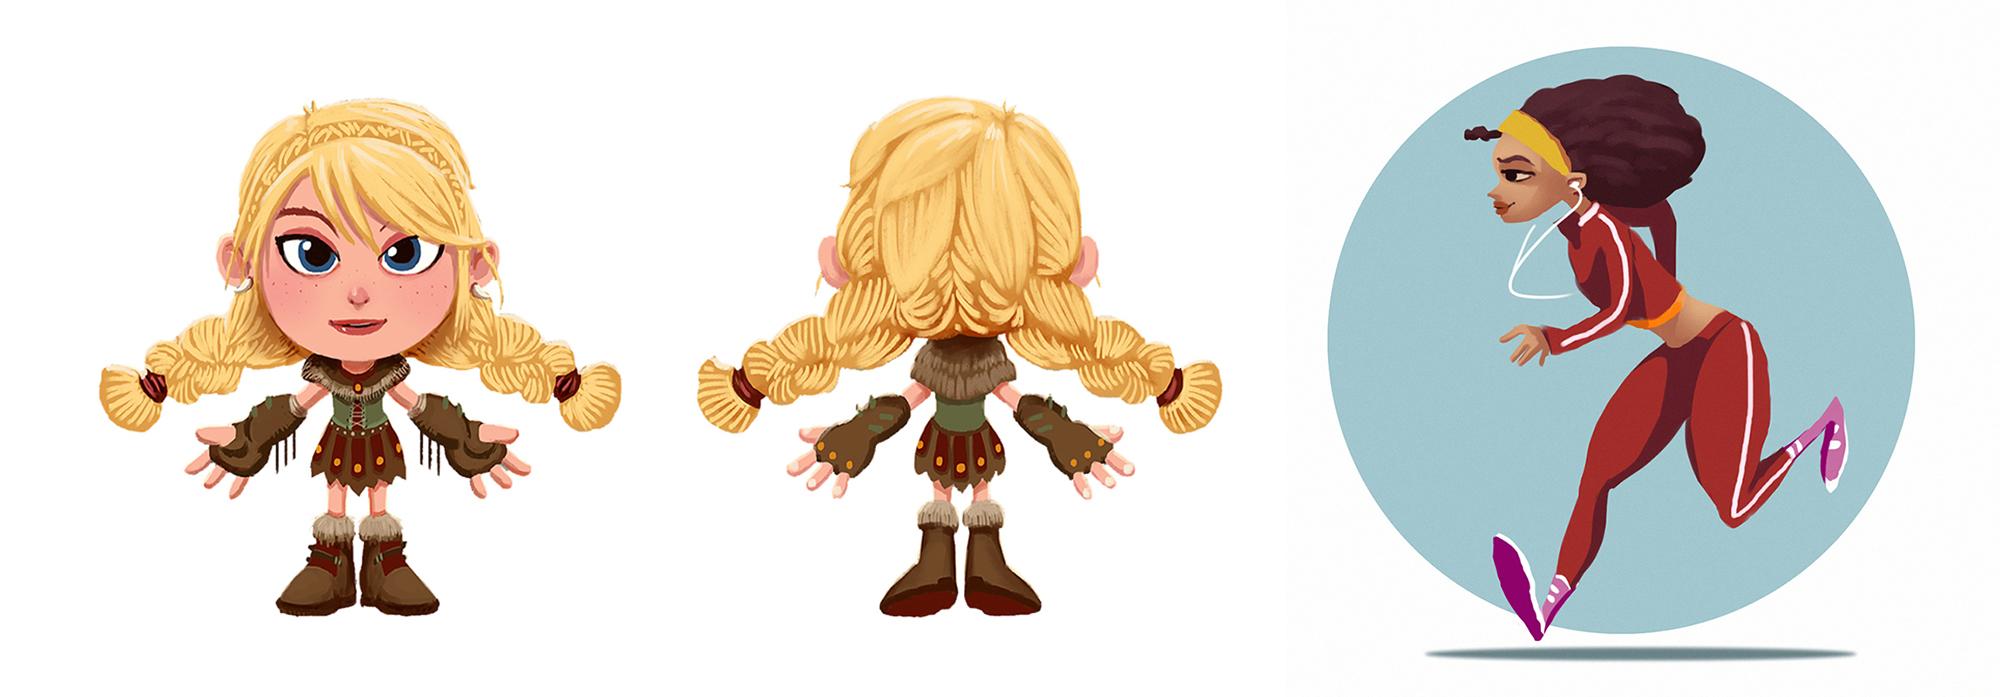 images?q=tbn:ANd9GcQh_l3eQ5xwiPy07kGEXjmjgmBKBRB7H2mRxCGhv1tFWg5c_mWT Ideas For Game Art Animation @koolgadgetz.com.info